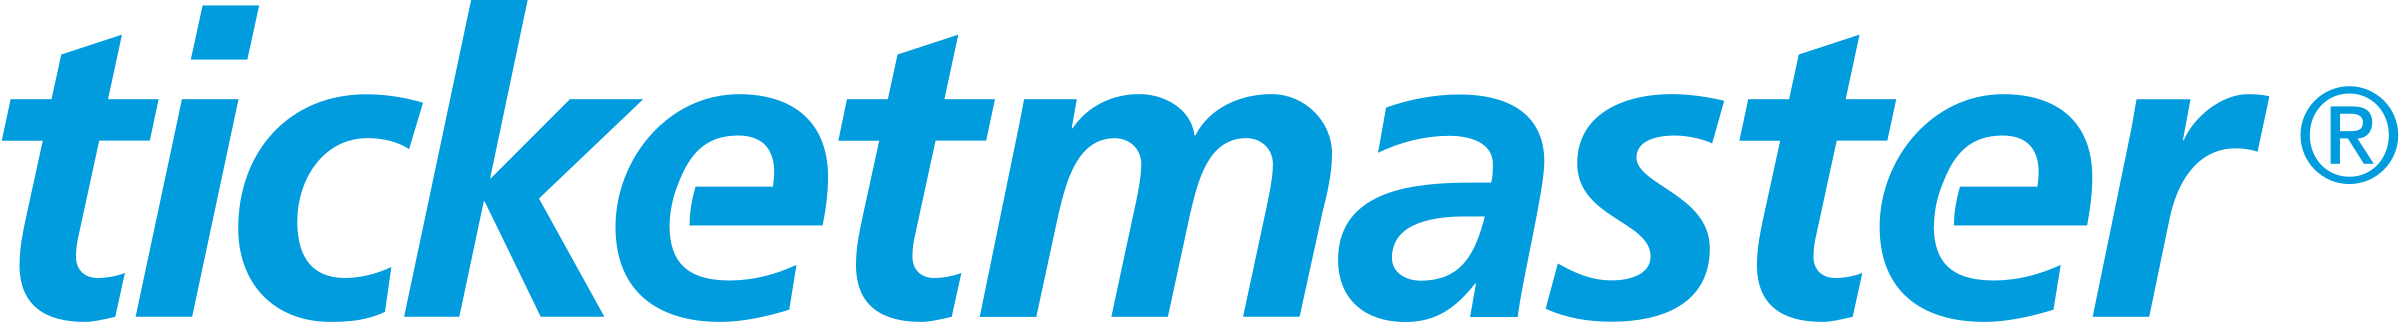 ticketmaster-5-logo-png-transparent.png